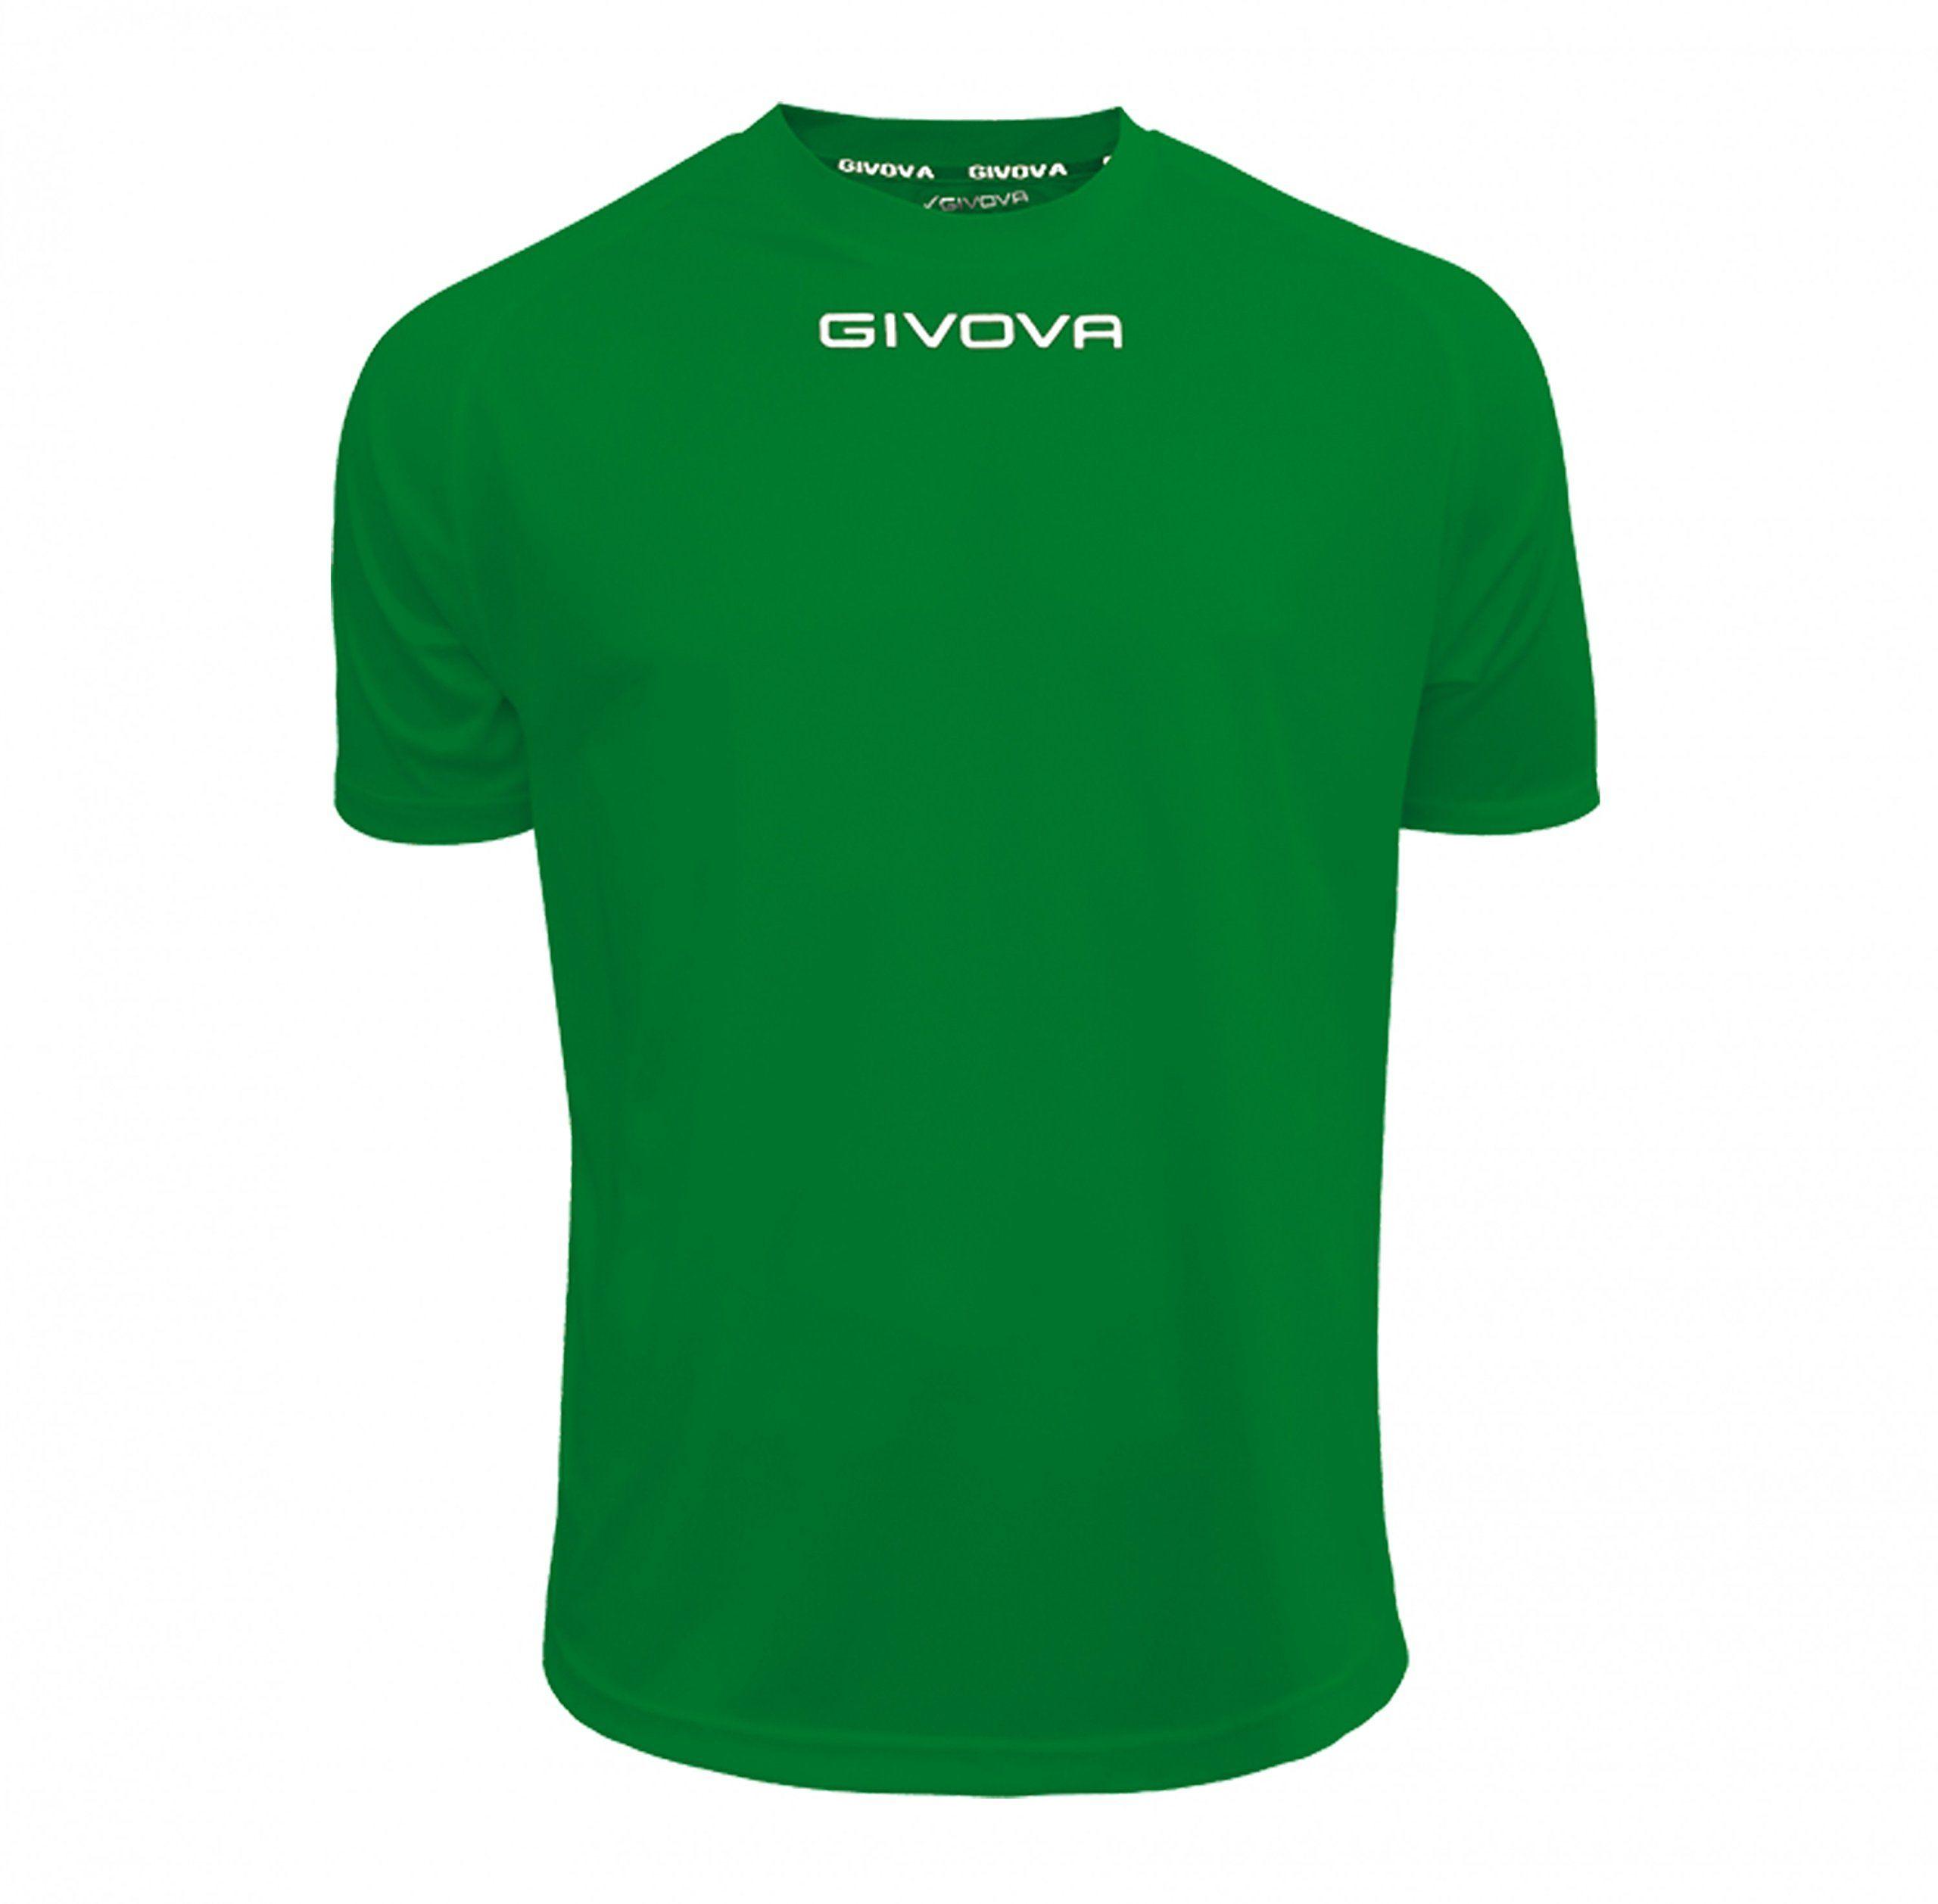 Givova - MAC01 koszulka sportowa, zielona, 2XL